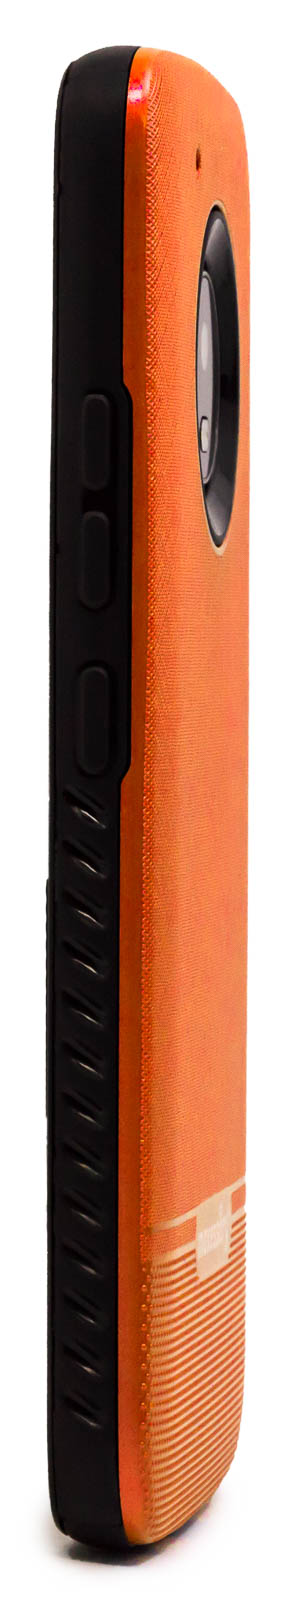 Moto-G5-Plus-Case-Moto-X-17-Case-Ultra-Thin-Hard-Body-Tactile-Shell-Cover thumbnail 23